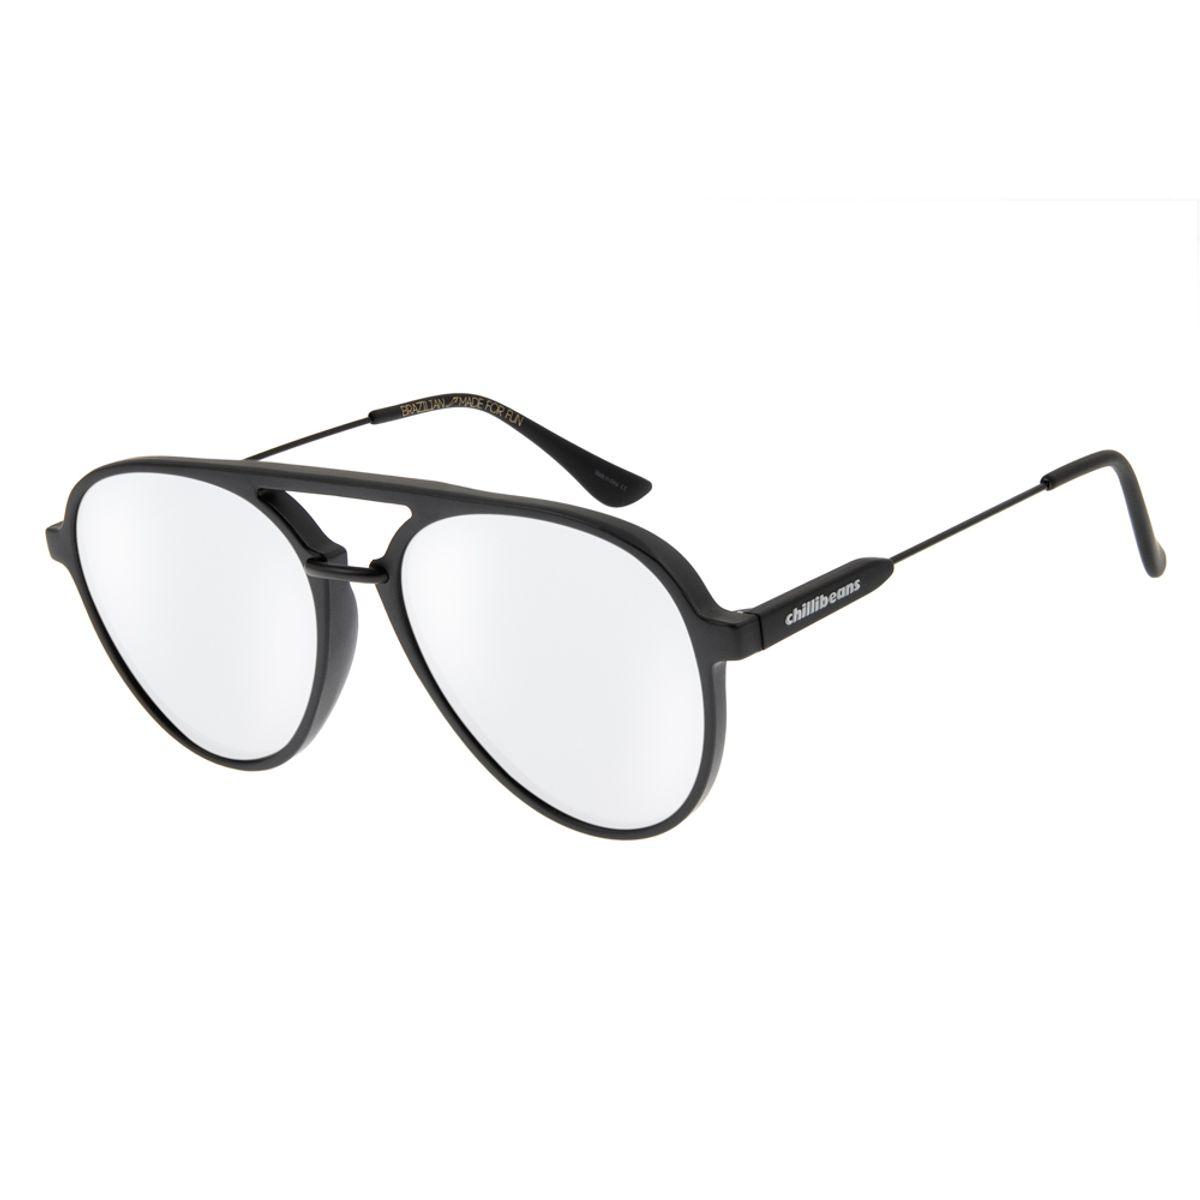 19e880fc0 Óculos de Sol Unissex Chilli Beans New Aviator Espelhado - Chilli Beans